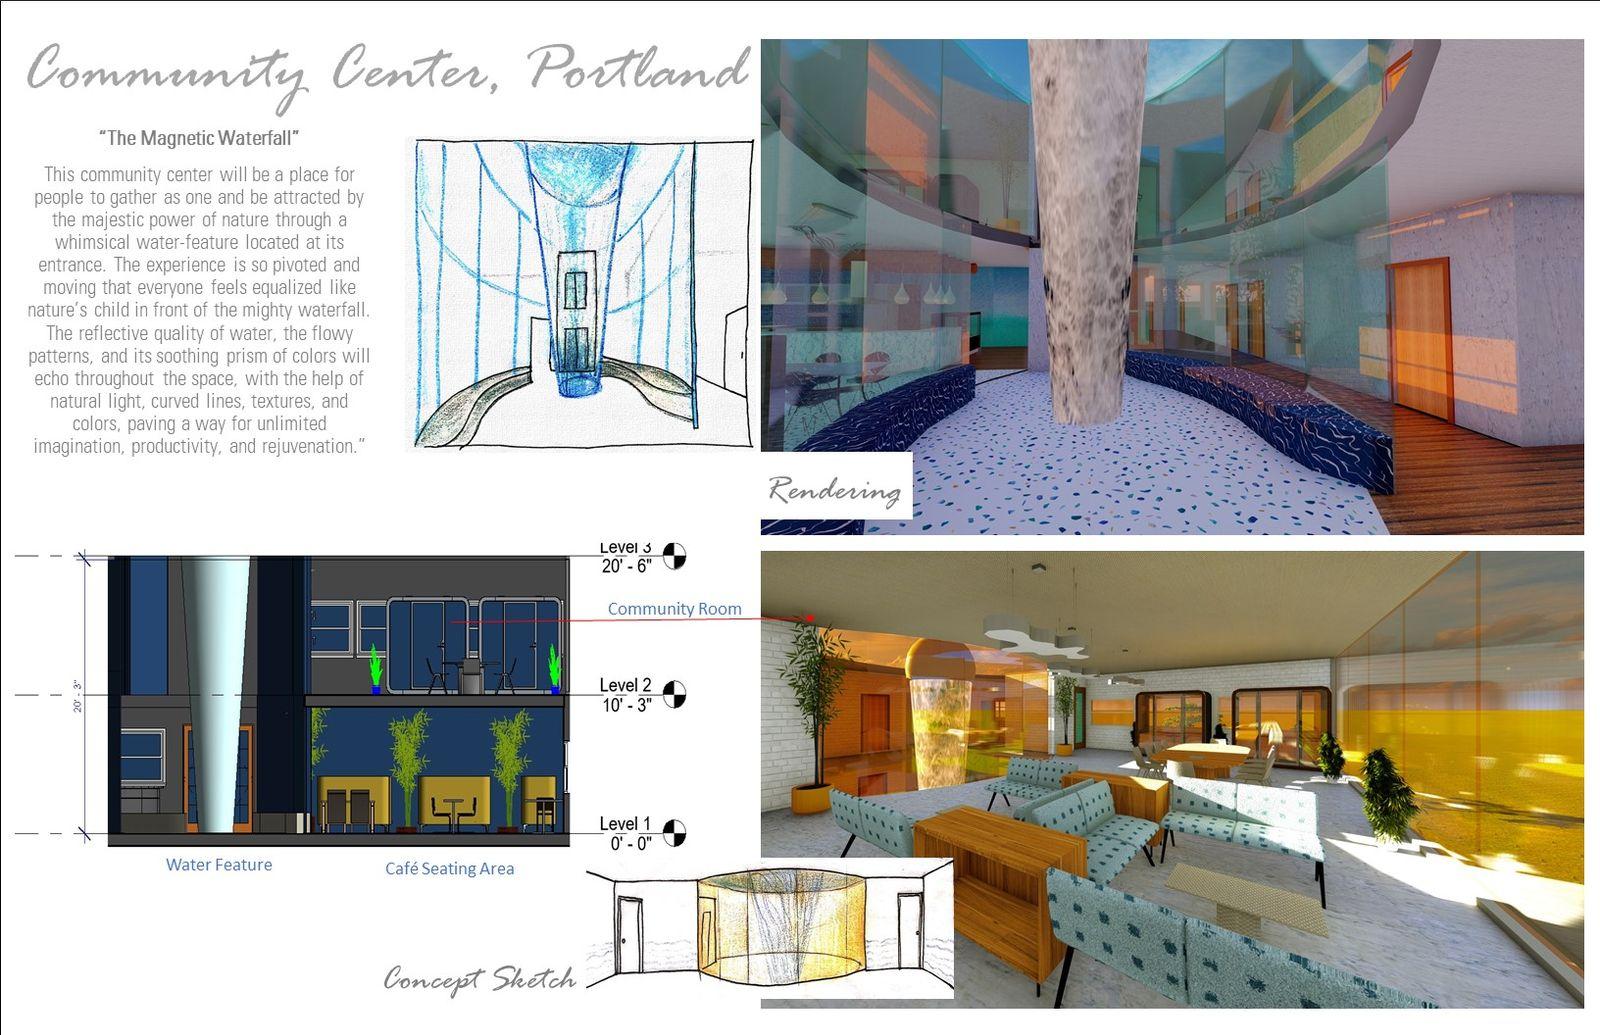 Community Center - Design Process